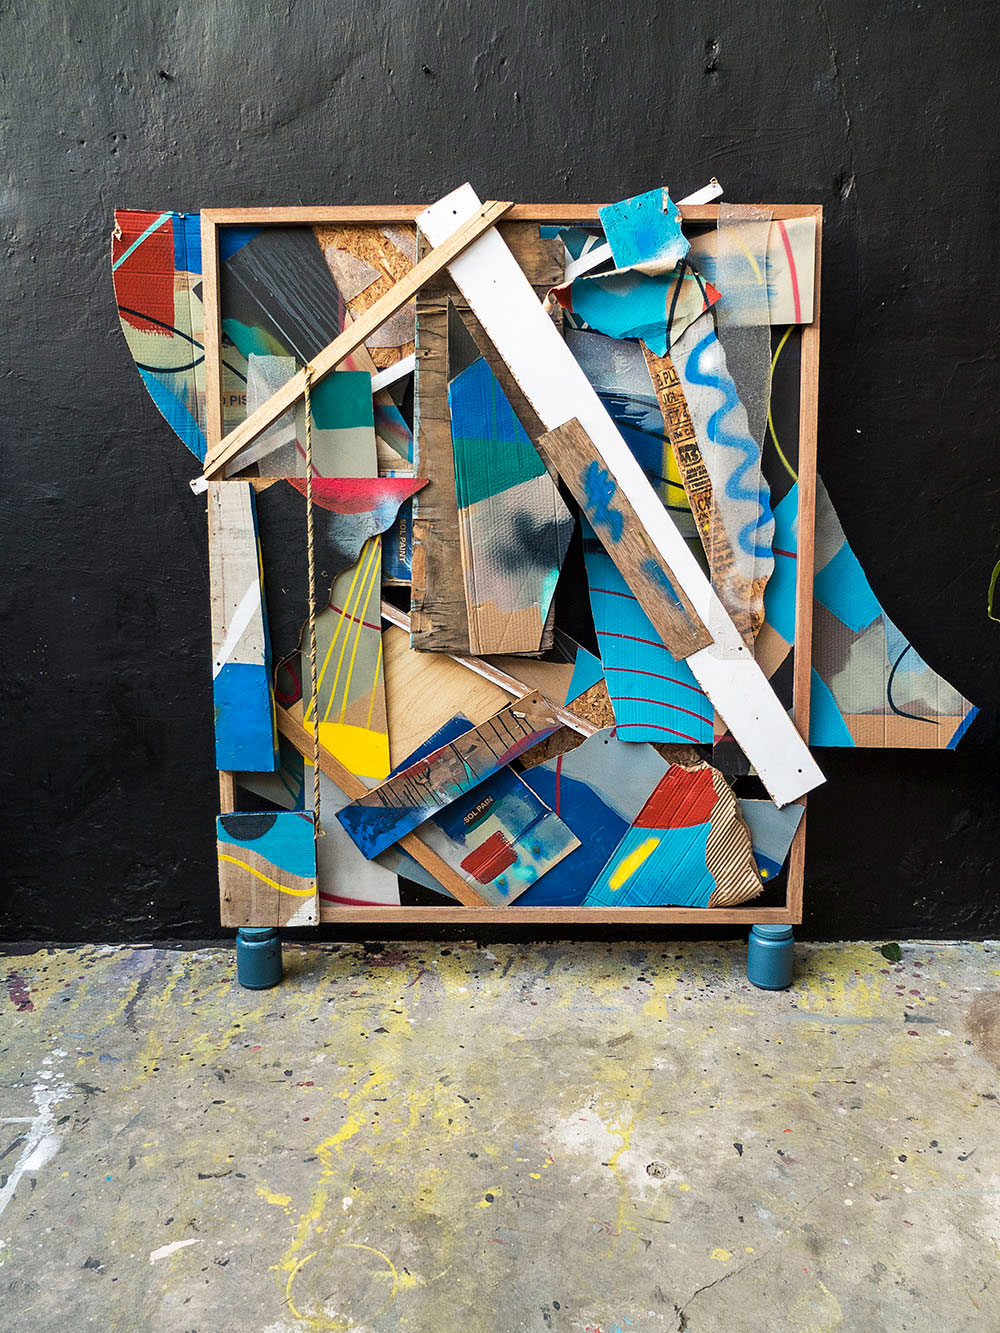 44flavours — Cemento – Lipsum Gallery